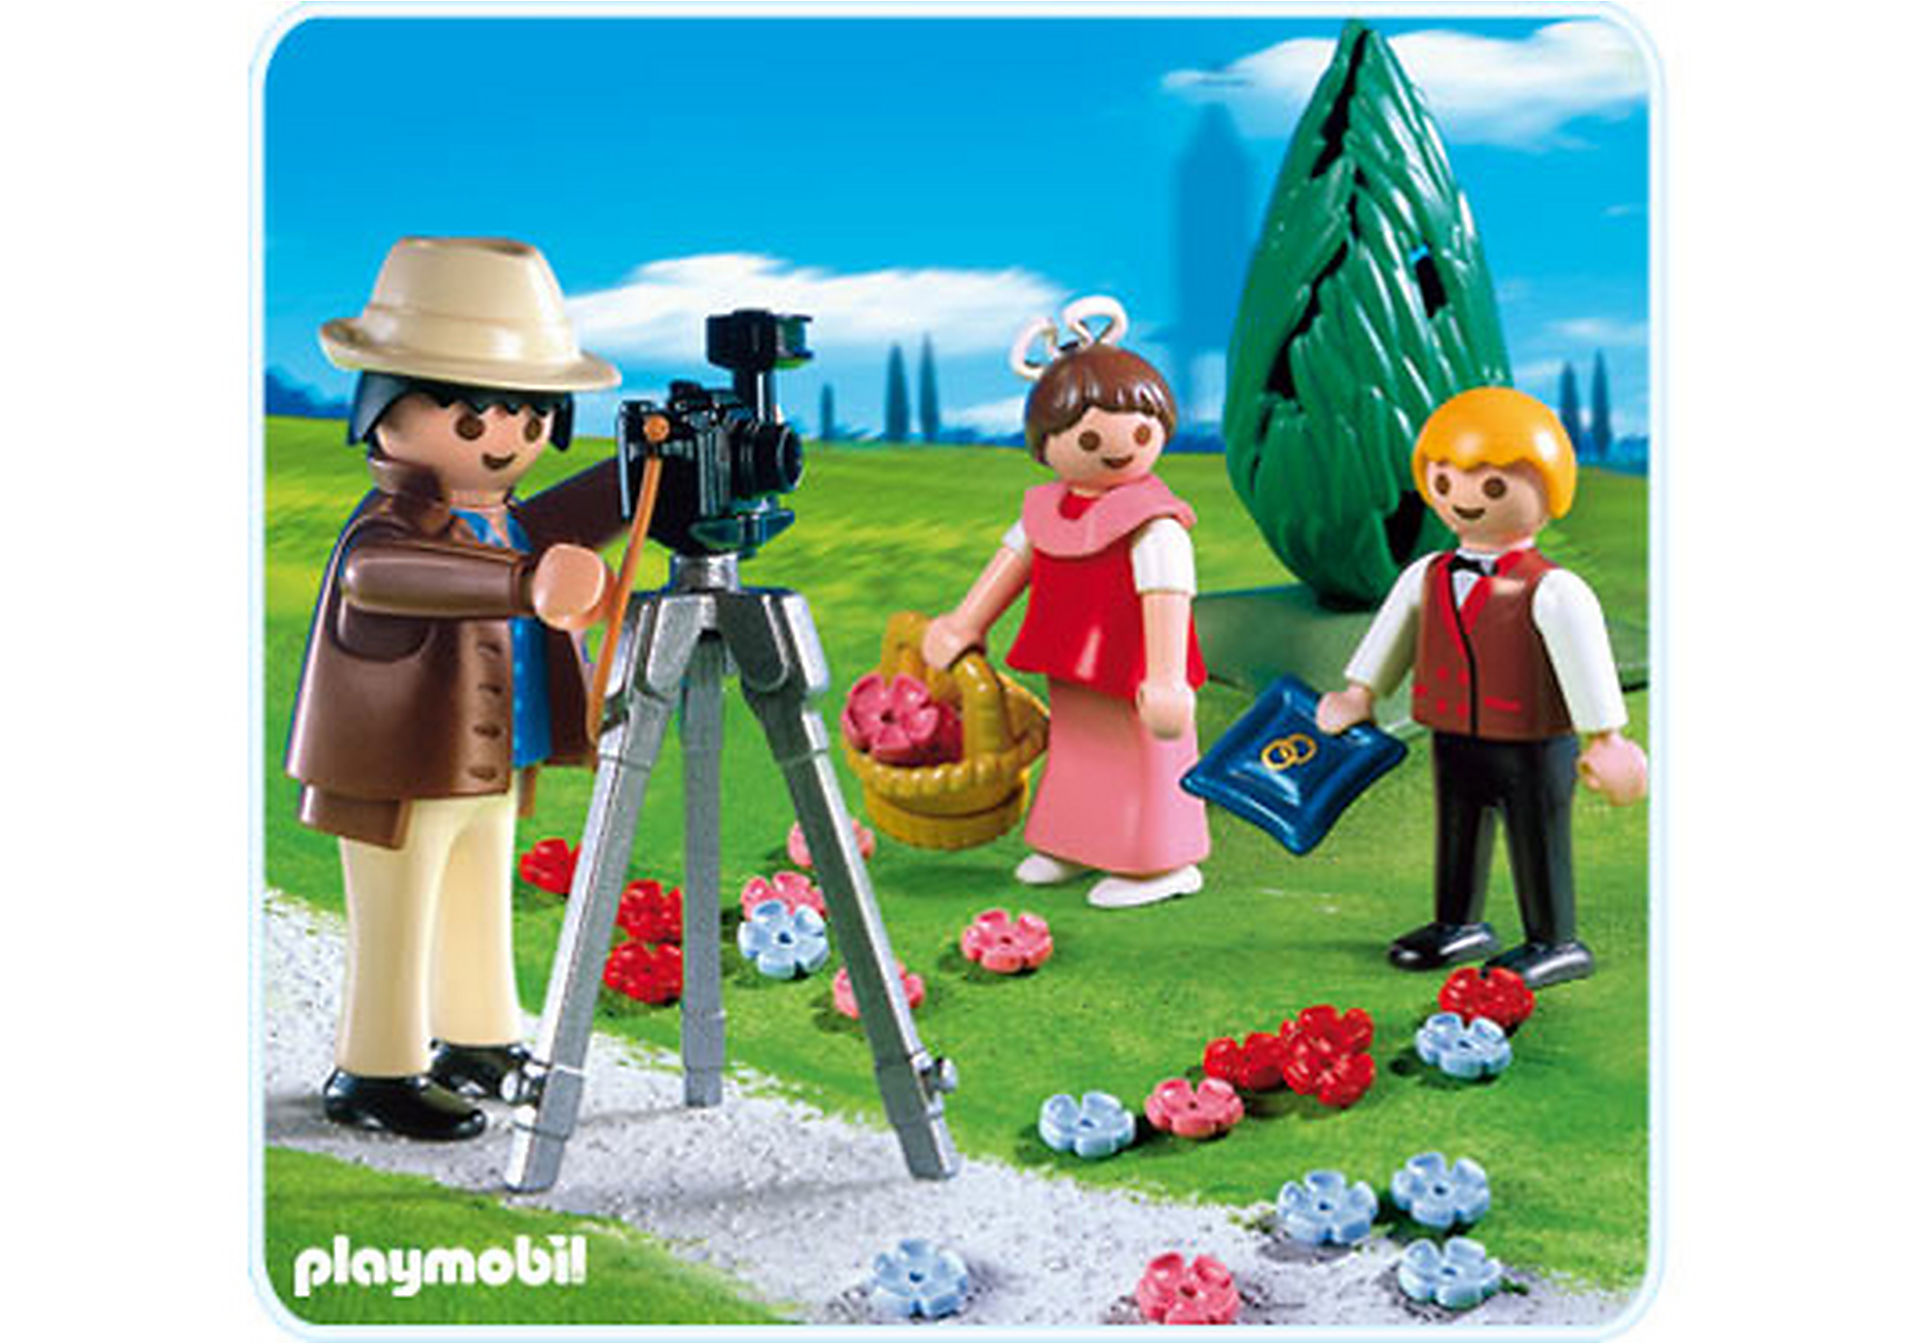 http://media.playmobil.com/i/playmobil/4299-A_product_detail/Photographe avec enfants d'honneur